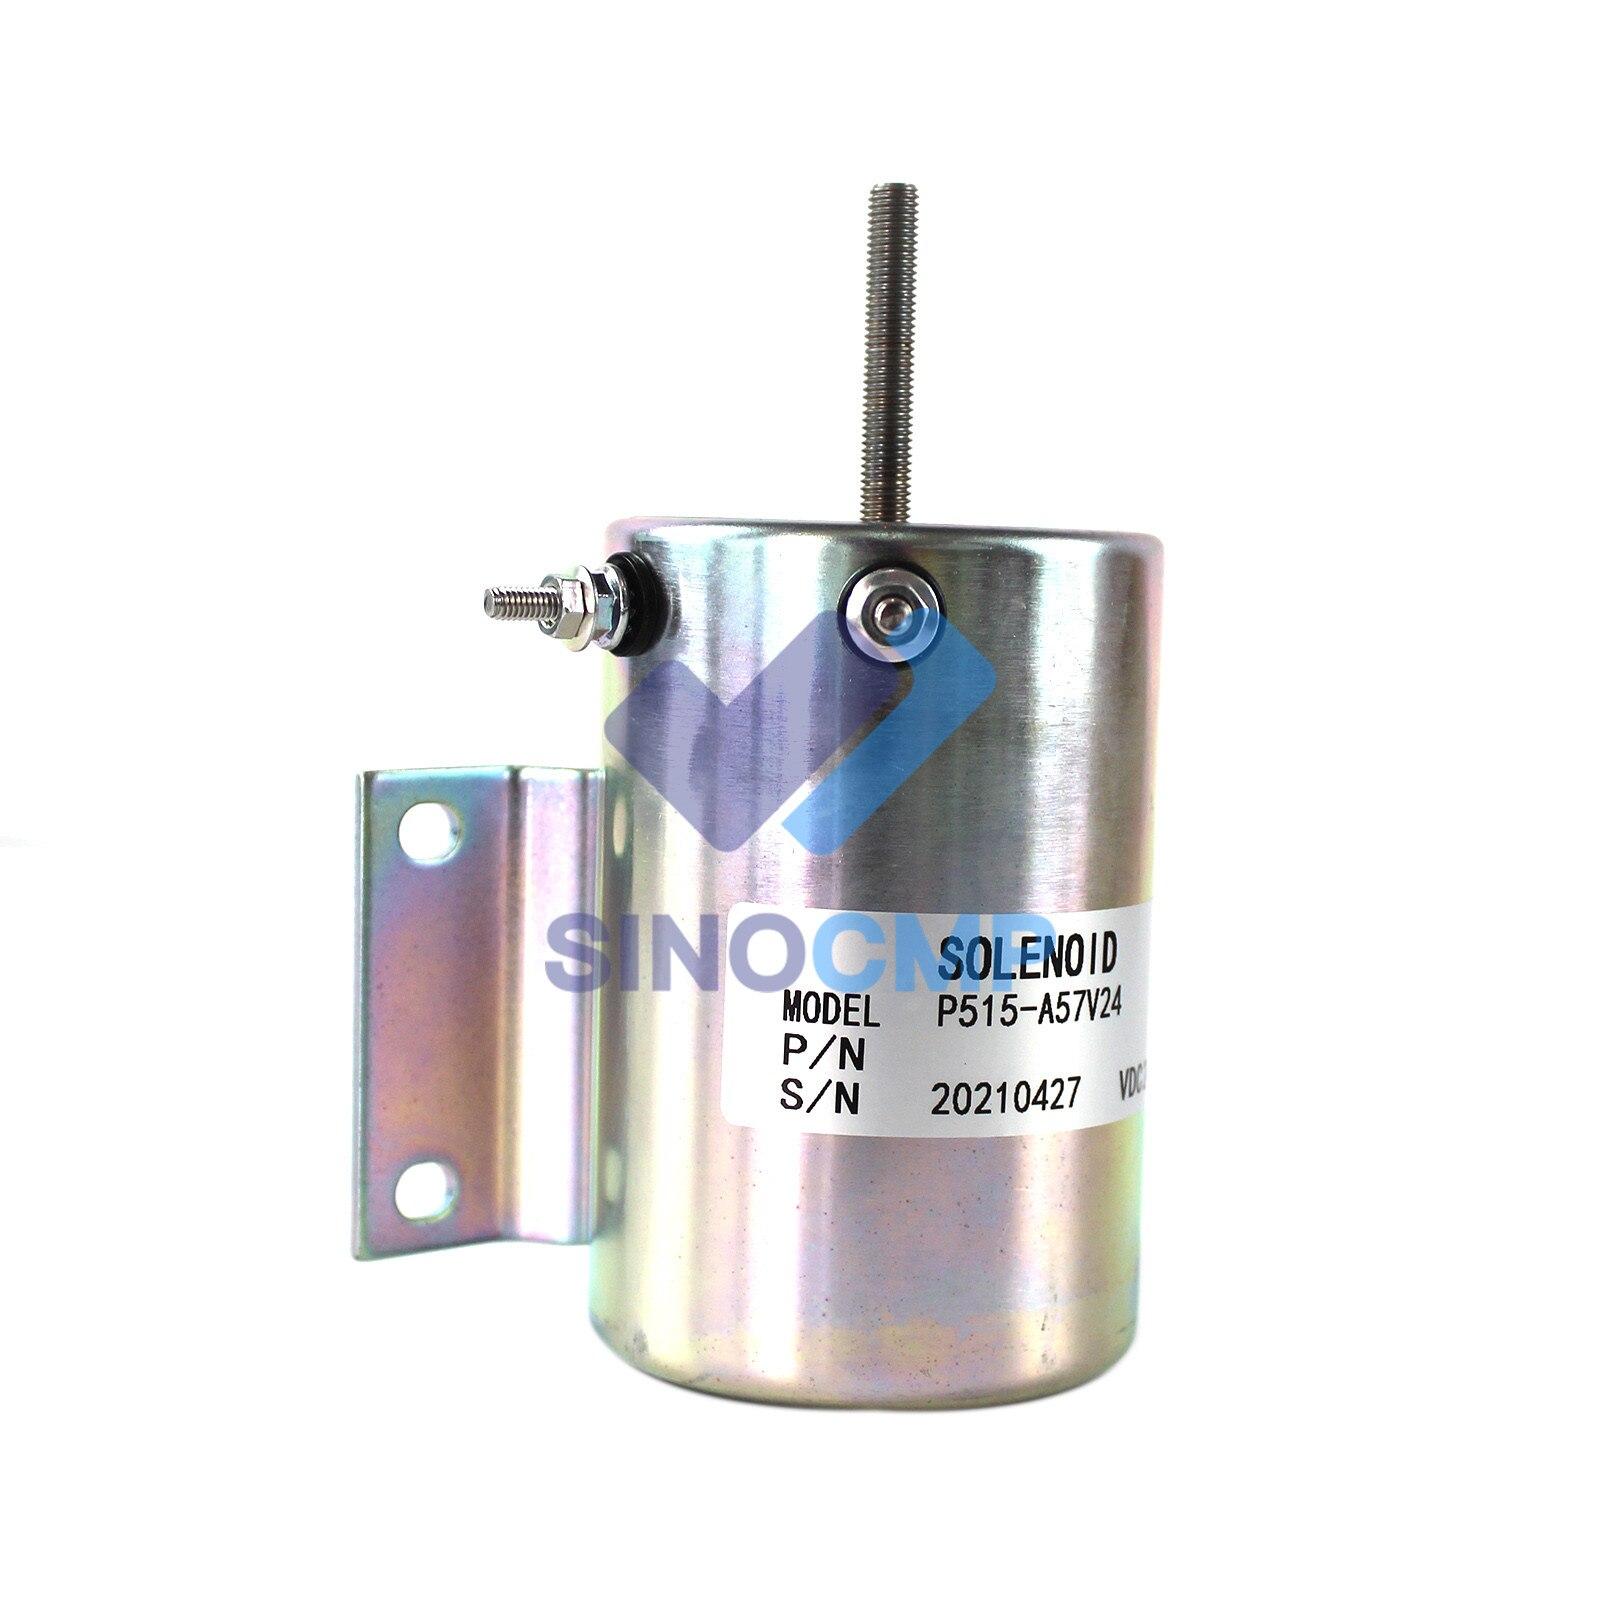 P515-A57V24 23504197 24V اغلاق الملف اللولبي ل F2l2011 Bf3l2011